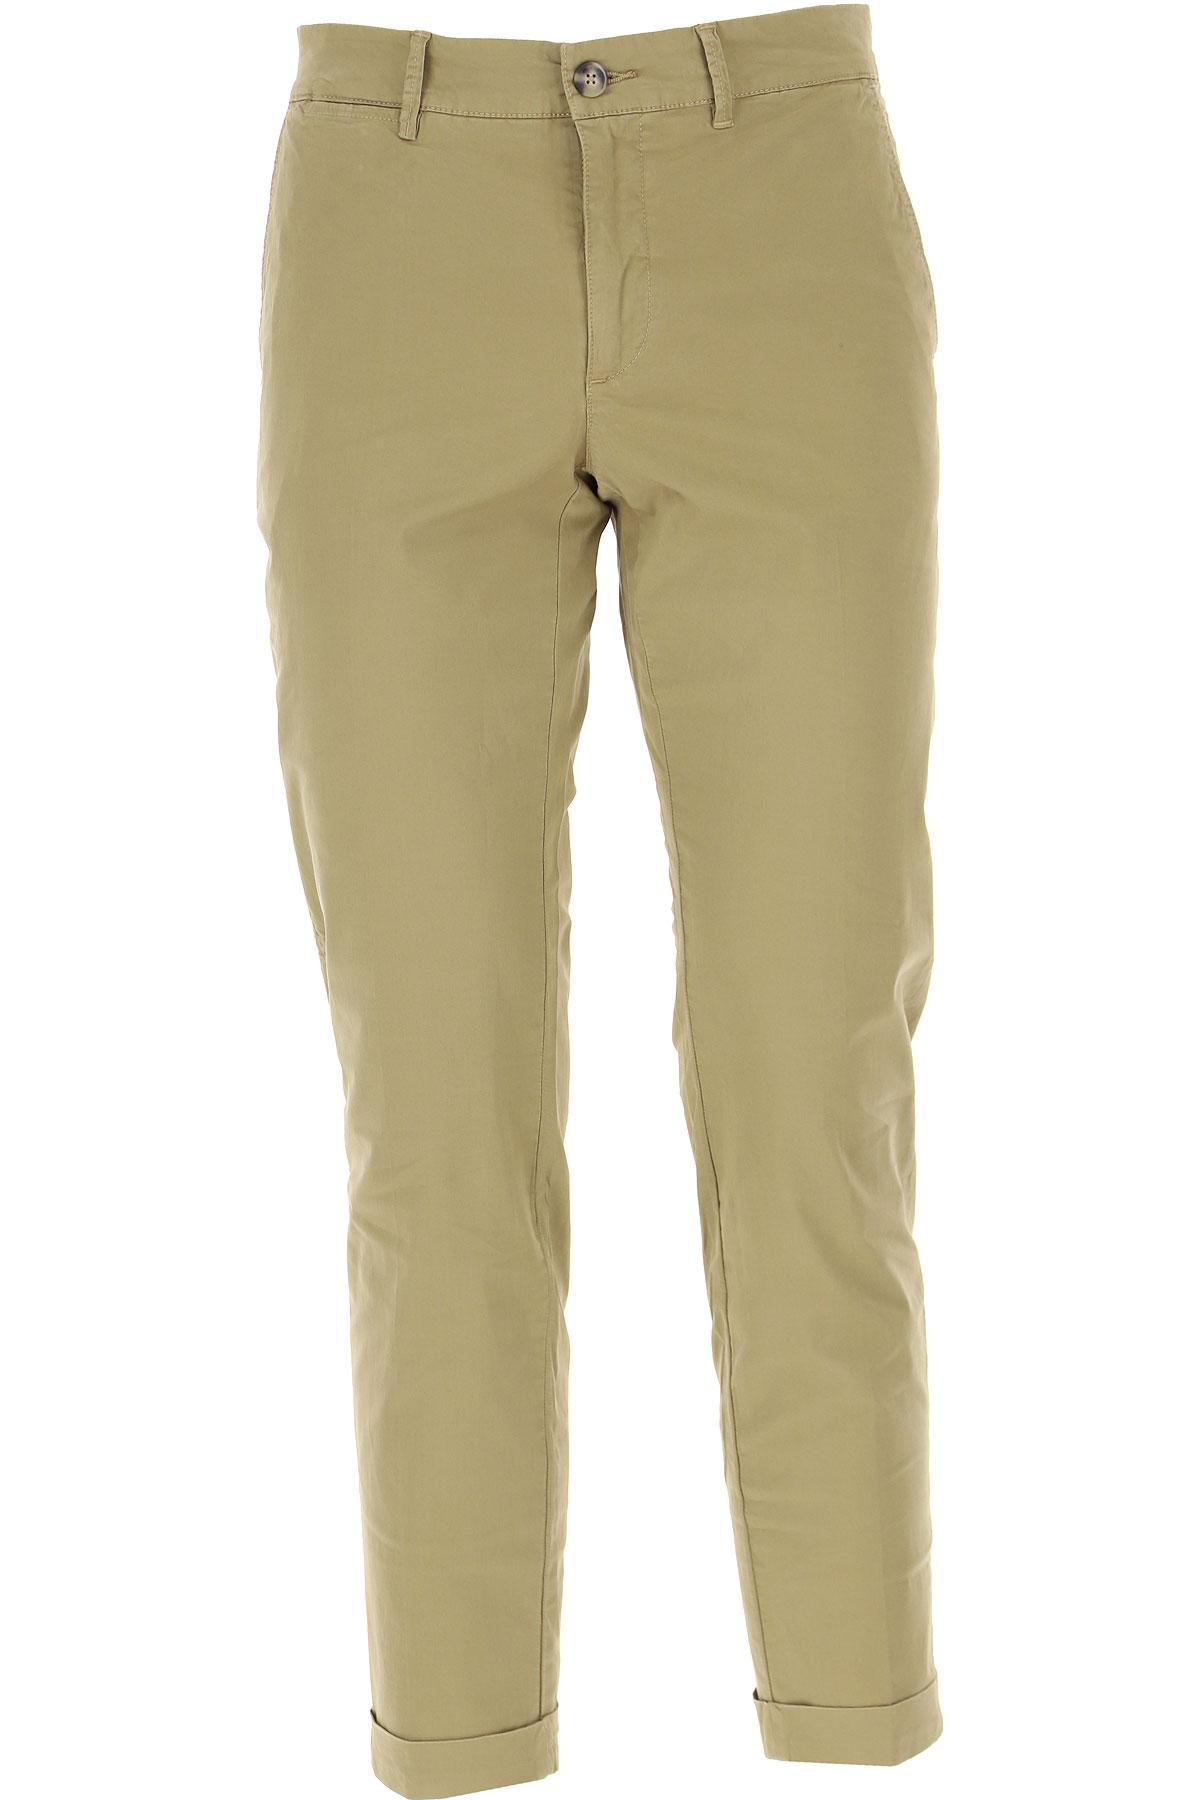 Jeckerson Pants for Men On Sale, Kaki, Cotton, 2019, 29 30 31 32 35 36 38 40